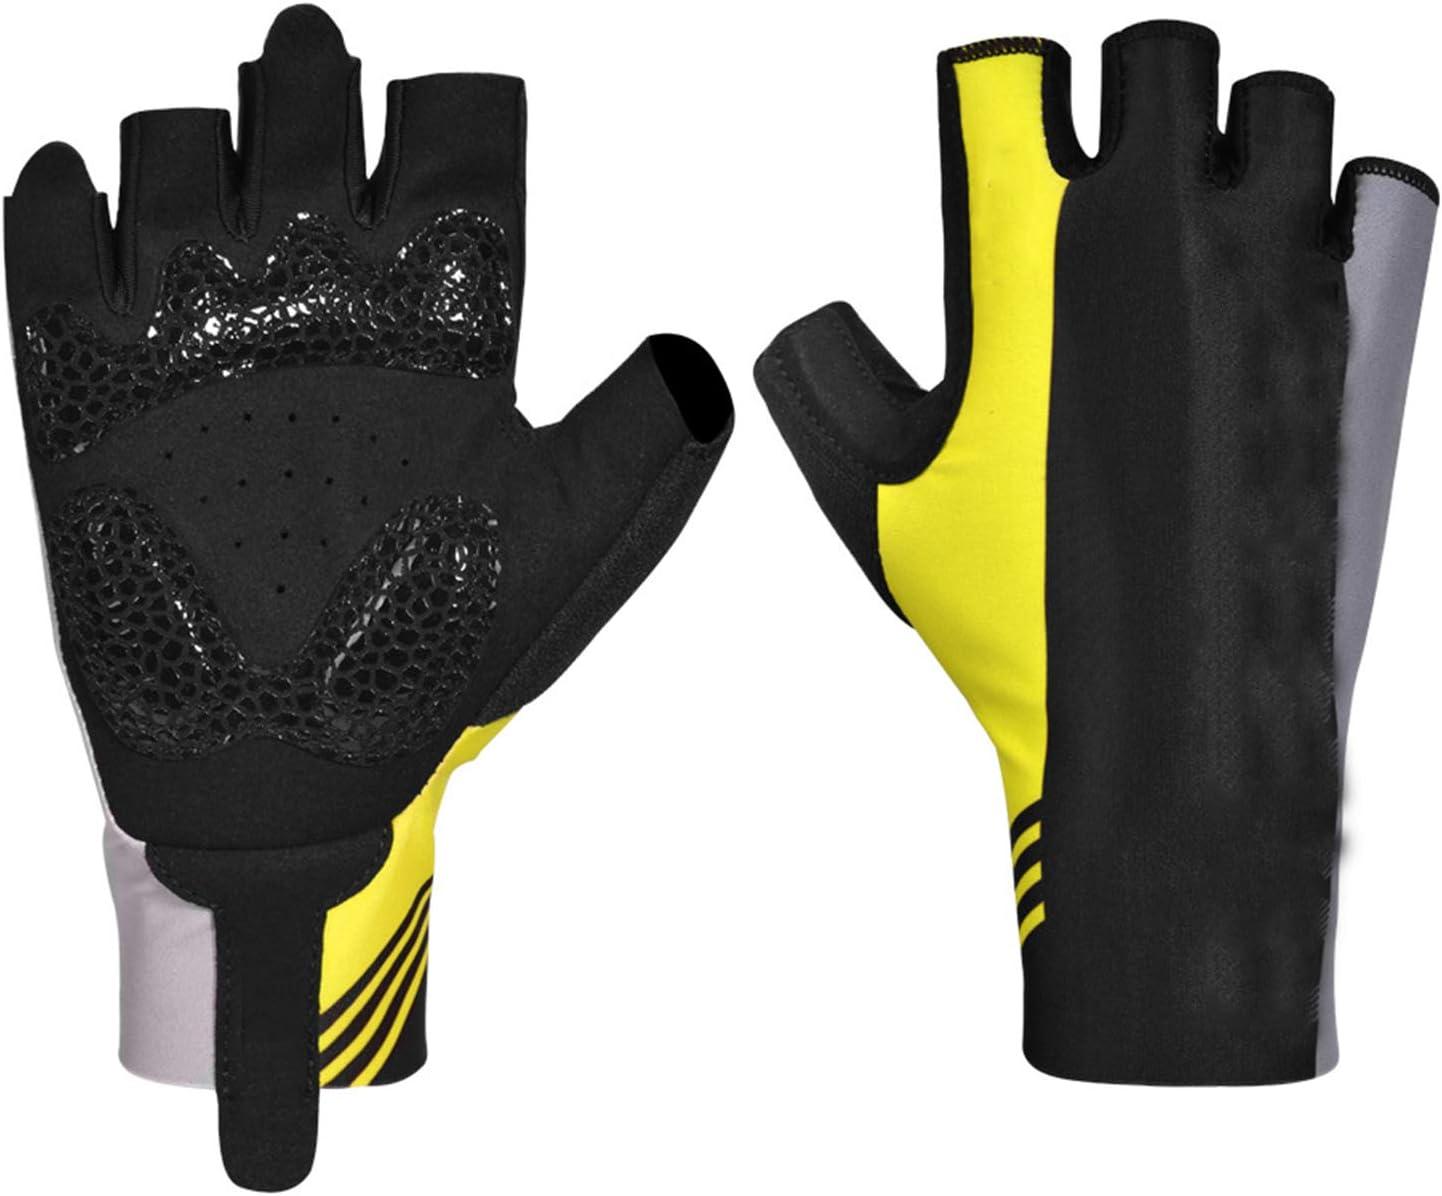 Overseas parallel import regular item Cycling Gloves Mountain Finally resale start Half Finger Gel Lycra Micr Padded